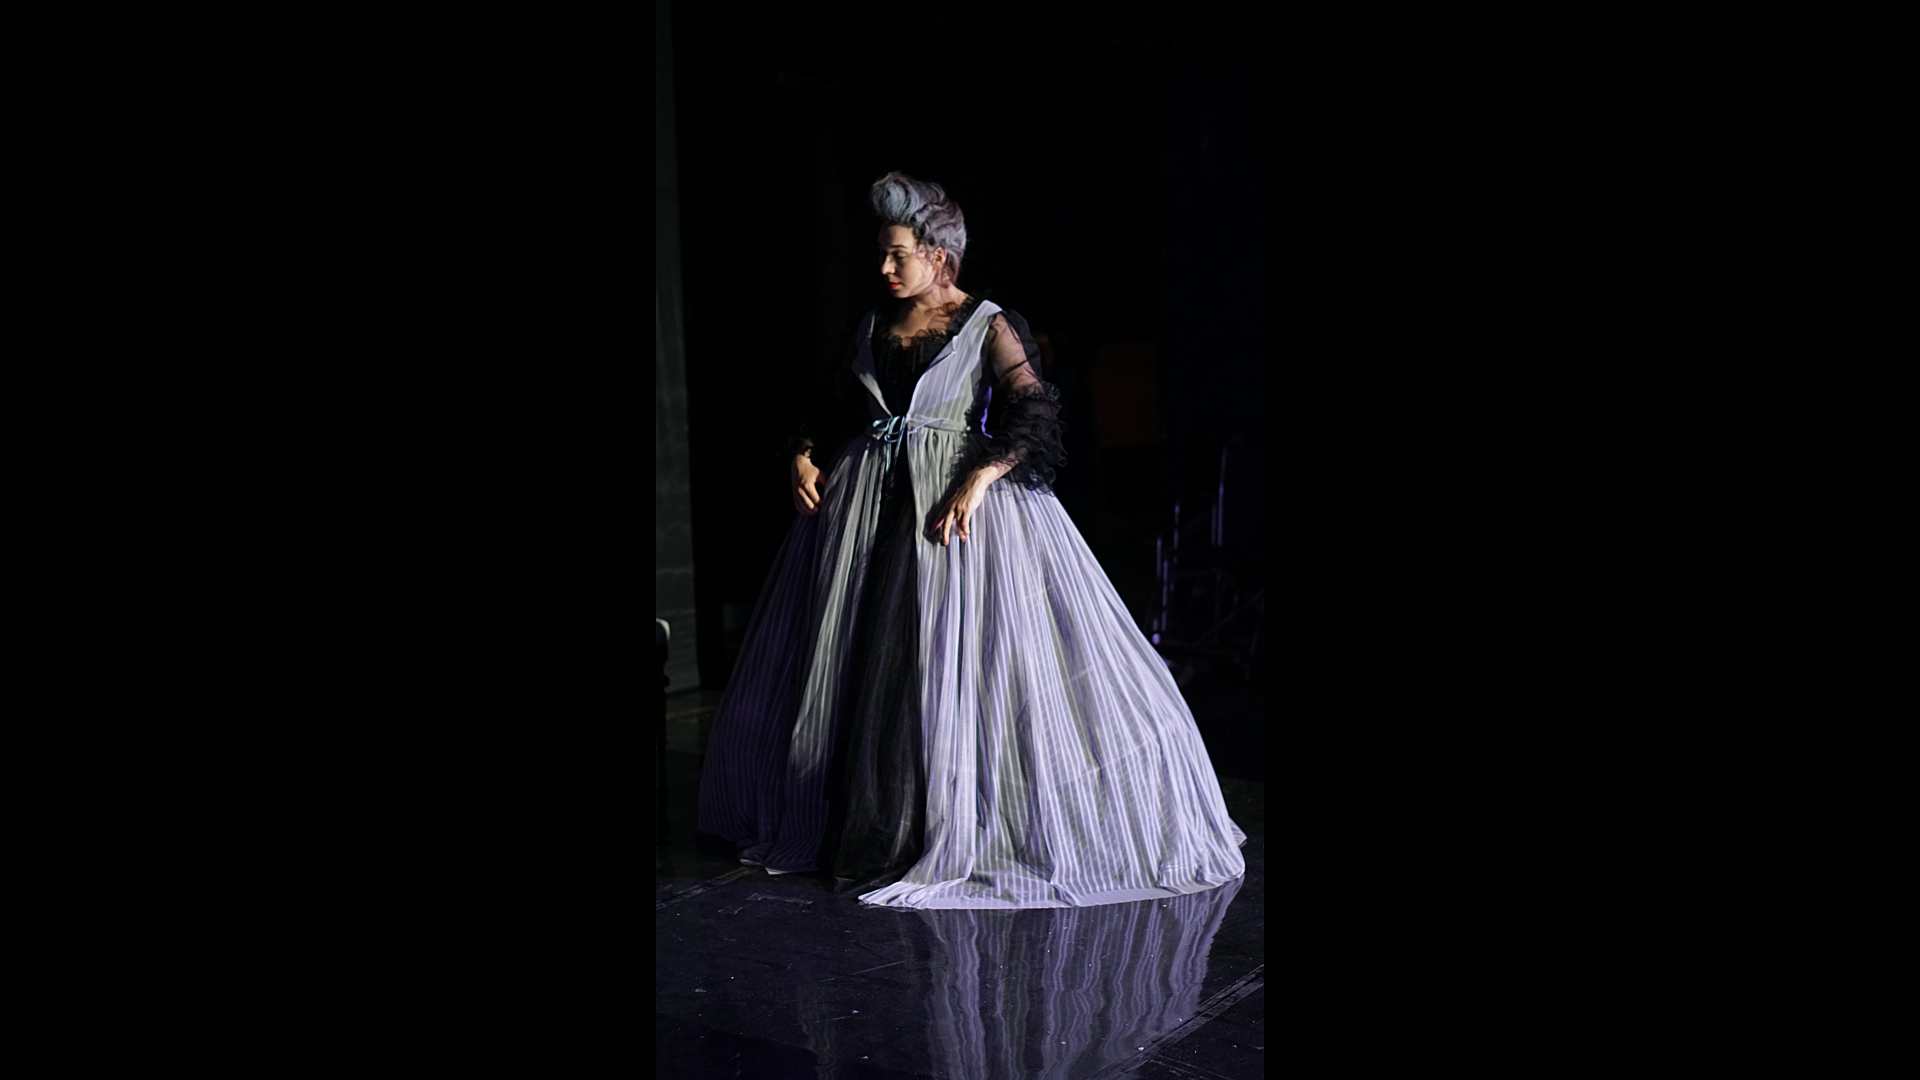 aktorka w sukni na scenie